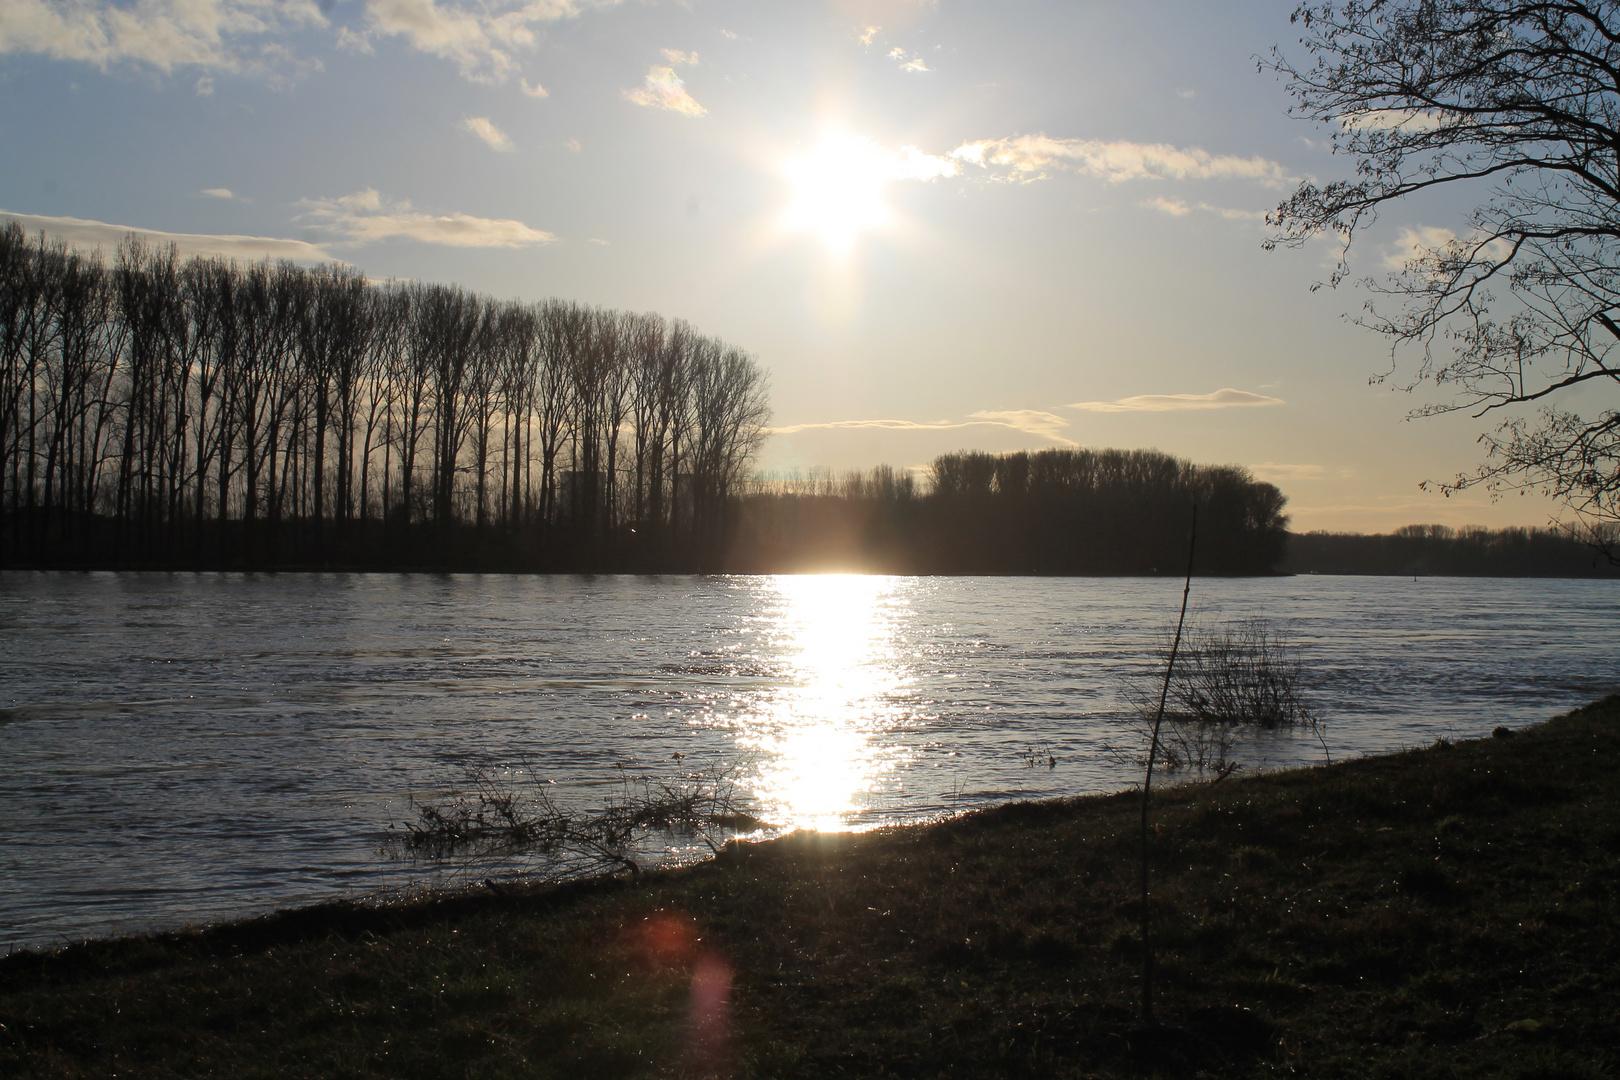 Der Sonnenuntergang am Rhein